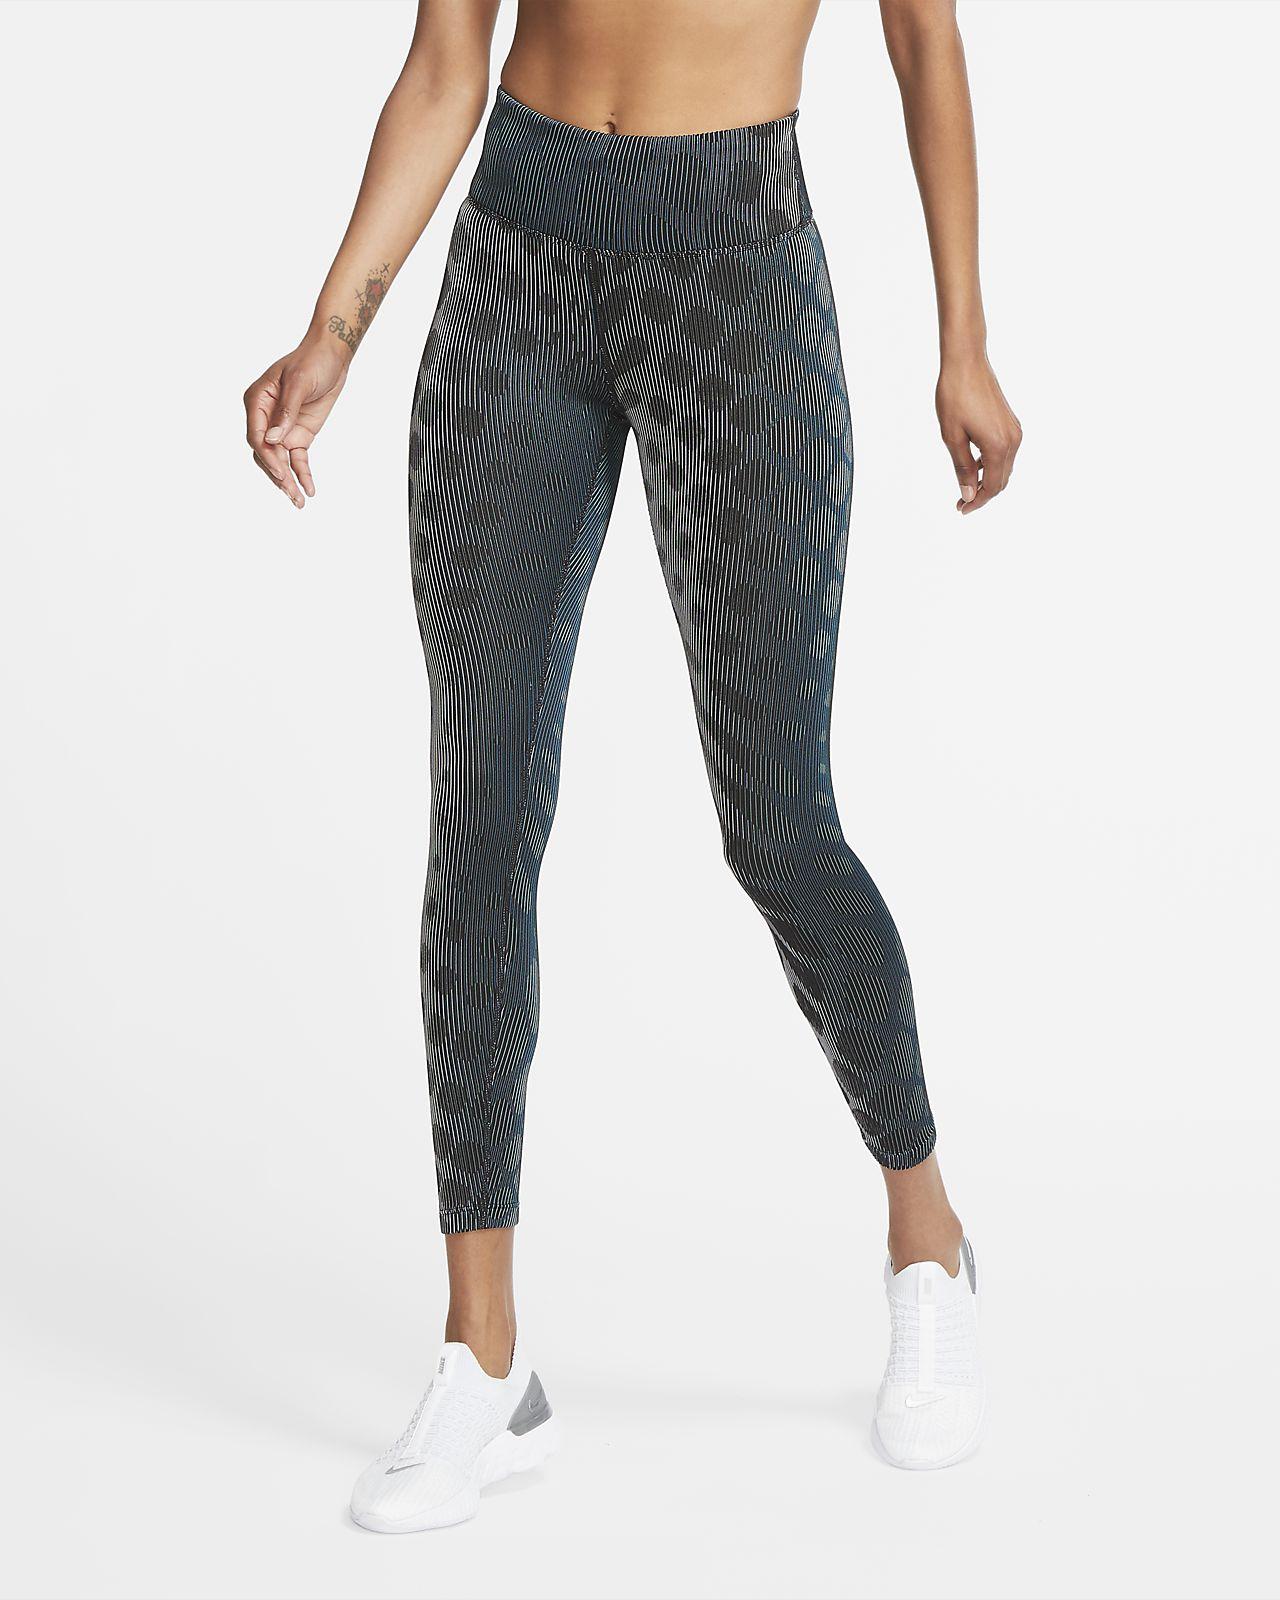 Legging de running 7/8 Nike Epic Luxe Run Division pour Femme